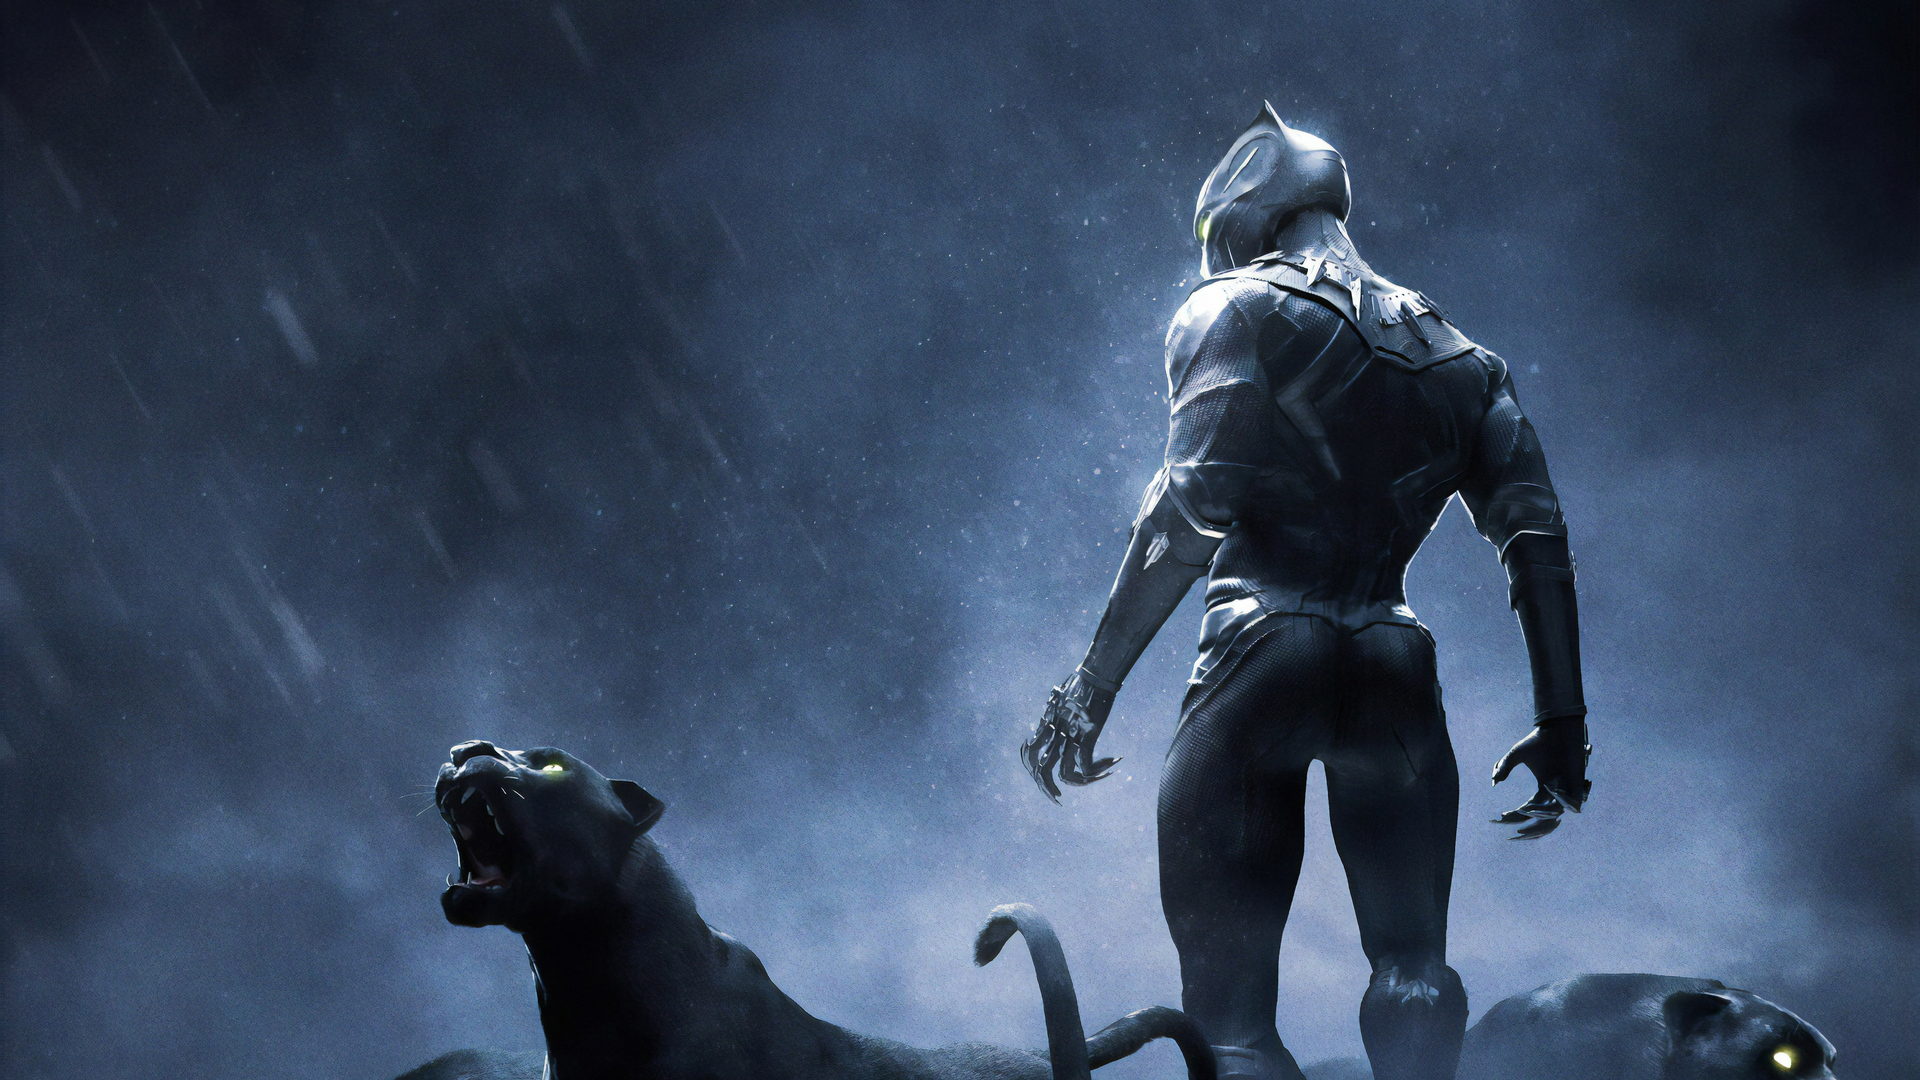 1920x1080 Black Panther Rise Up 4k Laptop Full HD 1080P HD ...